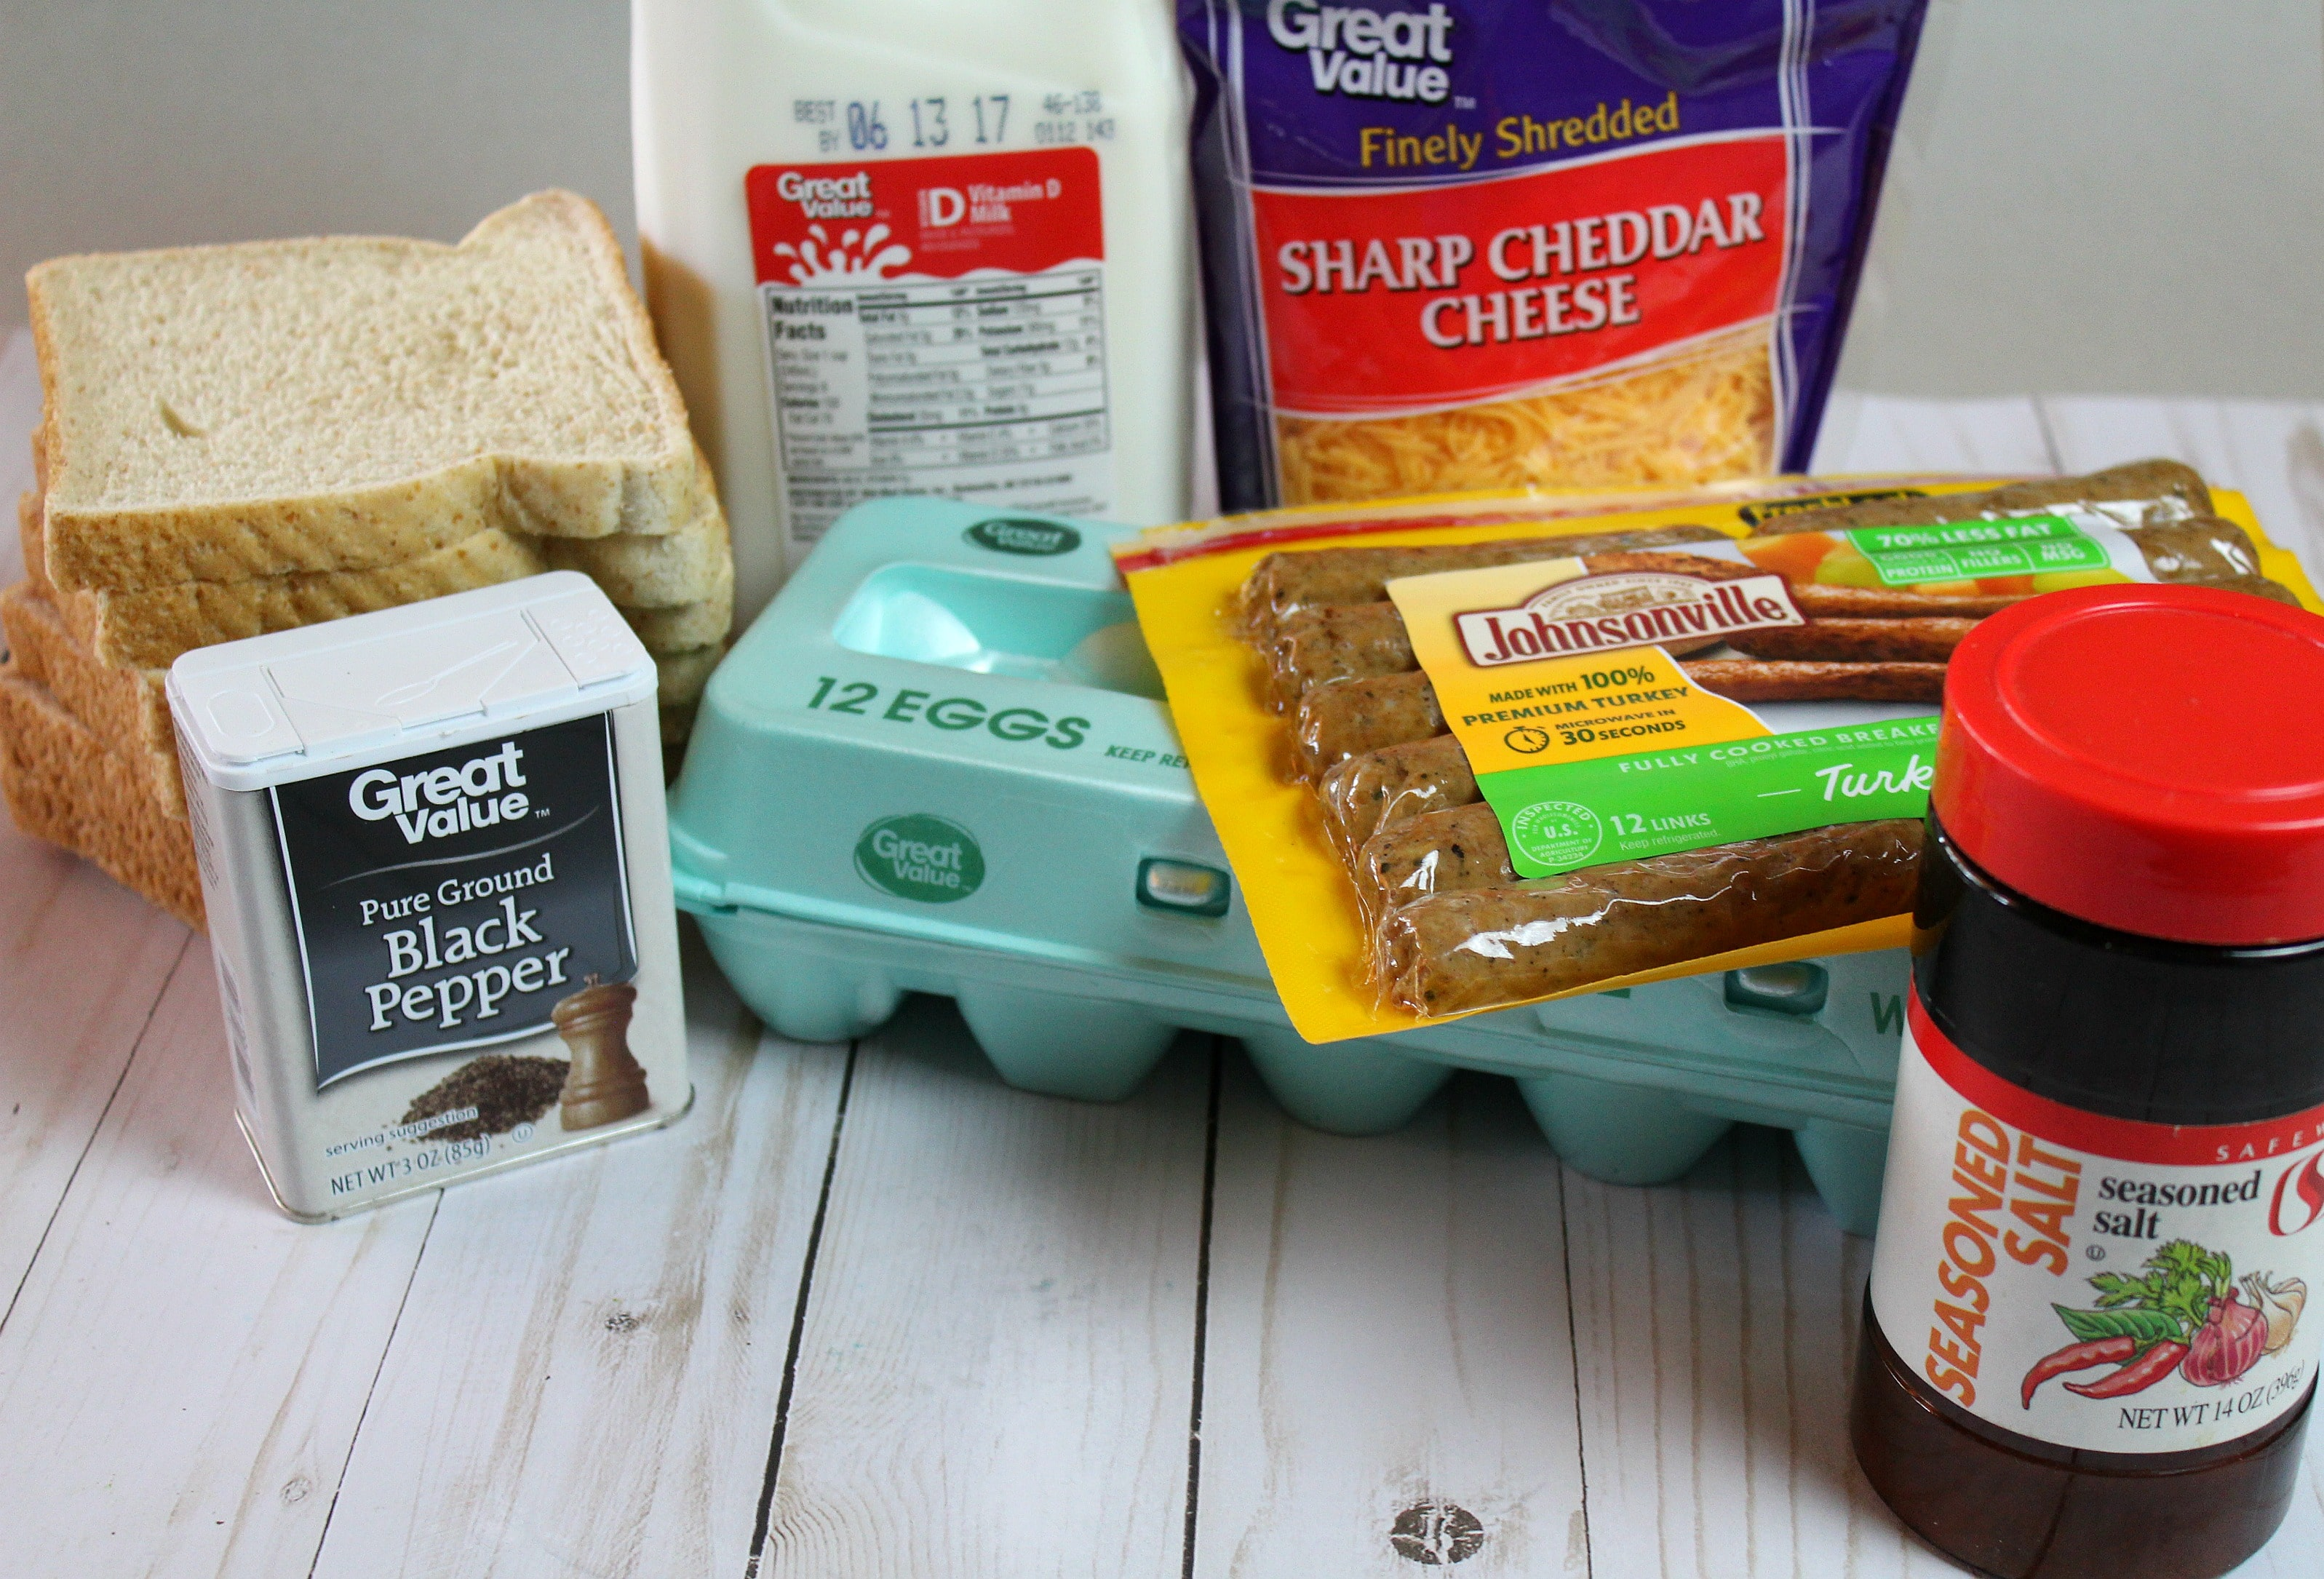 Freezer Breakfast Cupcakes | SBreakfast Cupcakes | Breakfast Cupcakes Ideas | Breakfast Cupcakes Recipe | Simple Breakfast Cupcakes | Easy Freezer Meals | Meal Planning | Easy Freezer Breakfast Cupcakes